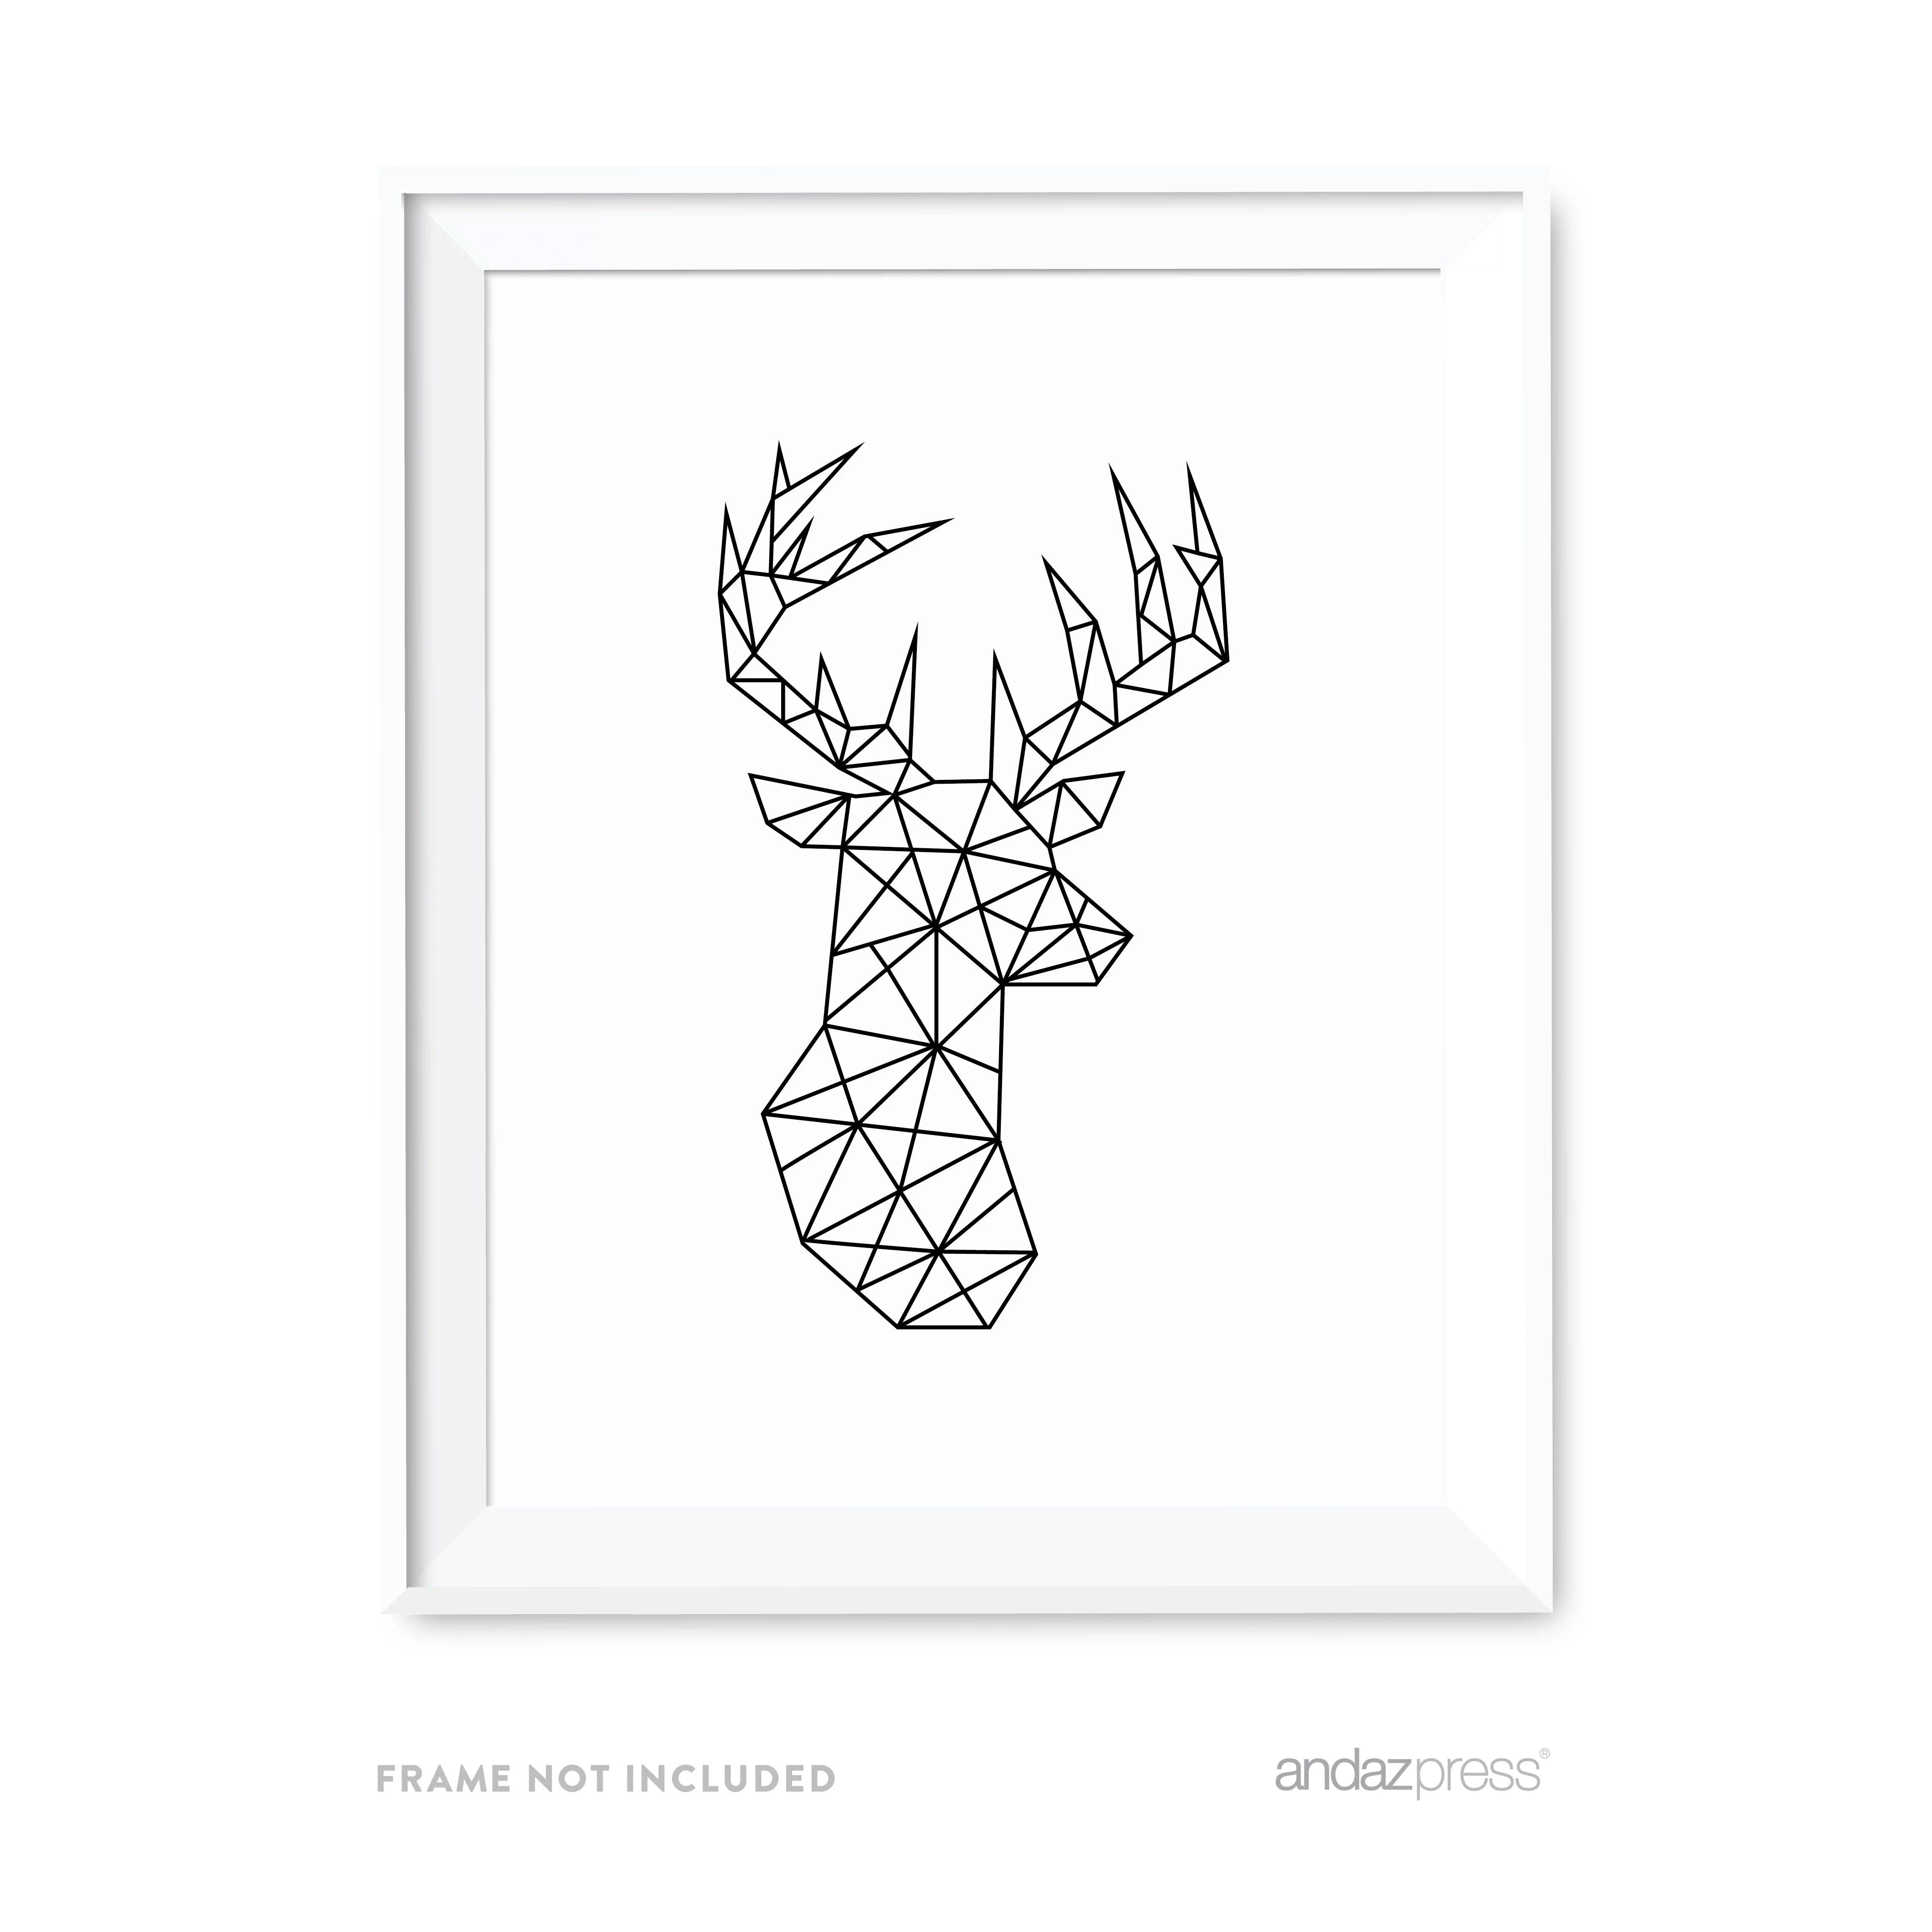 Deer Geometric Animal Origami Wall Art Black White